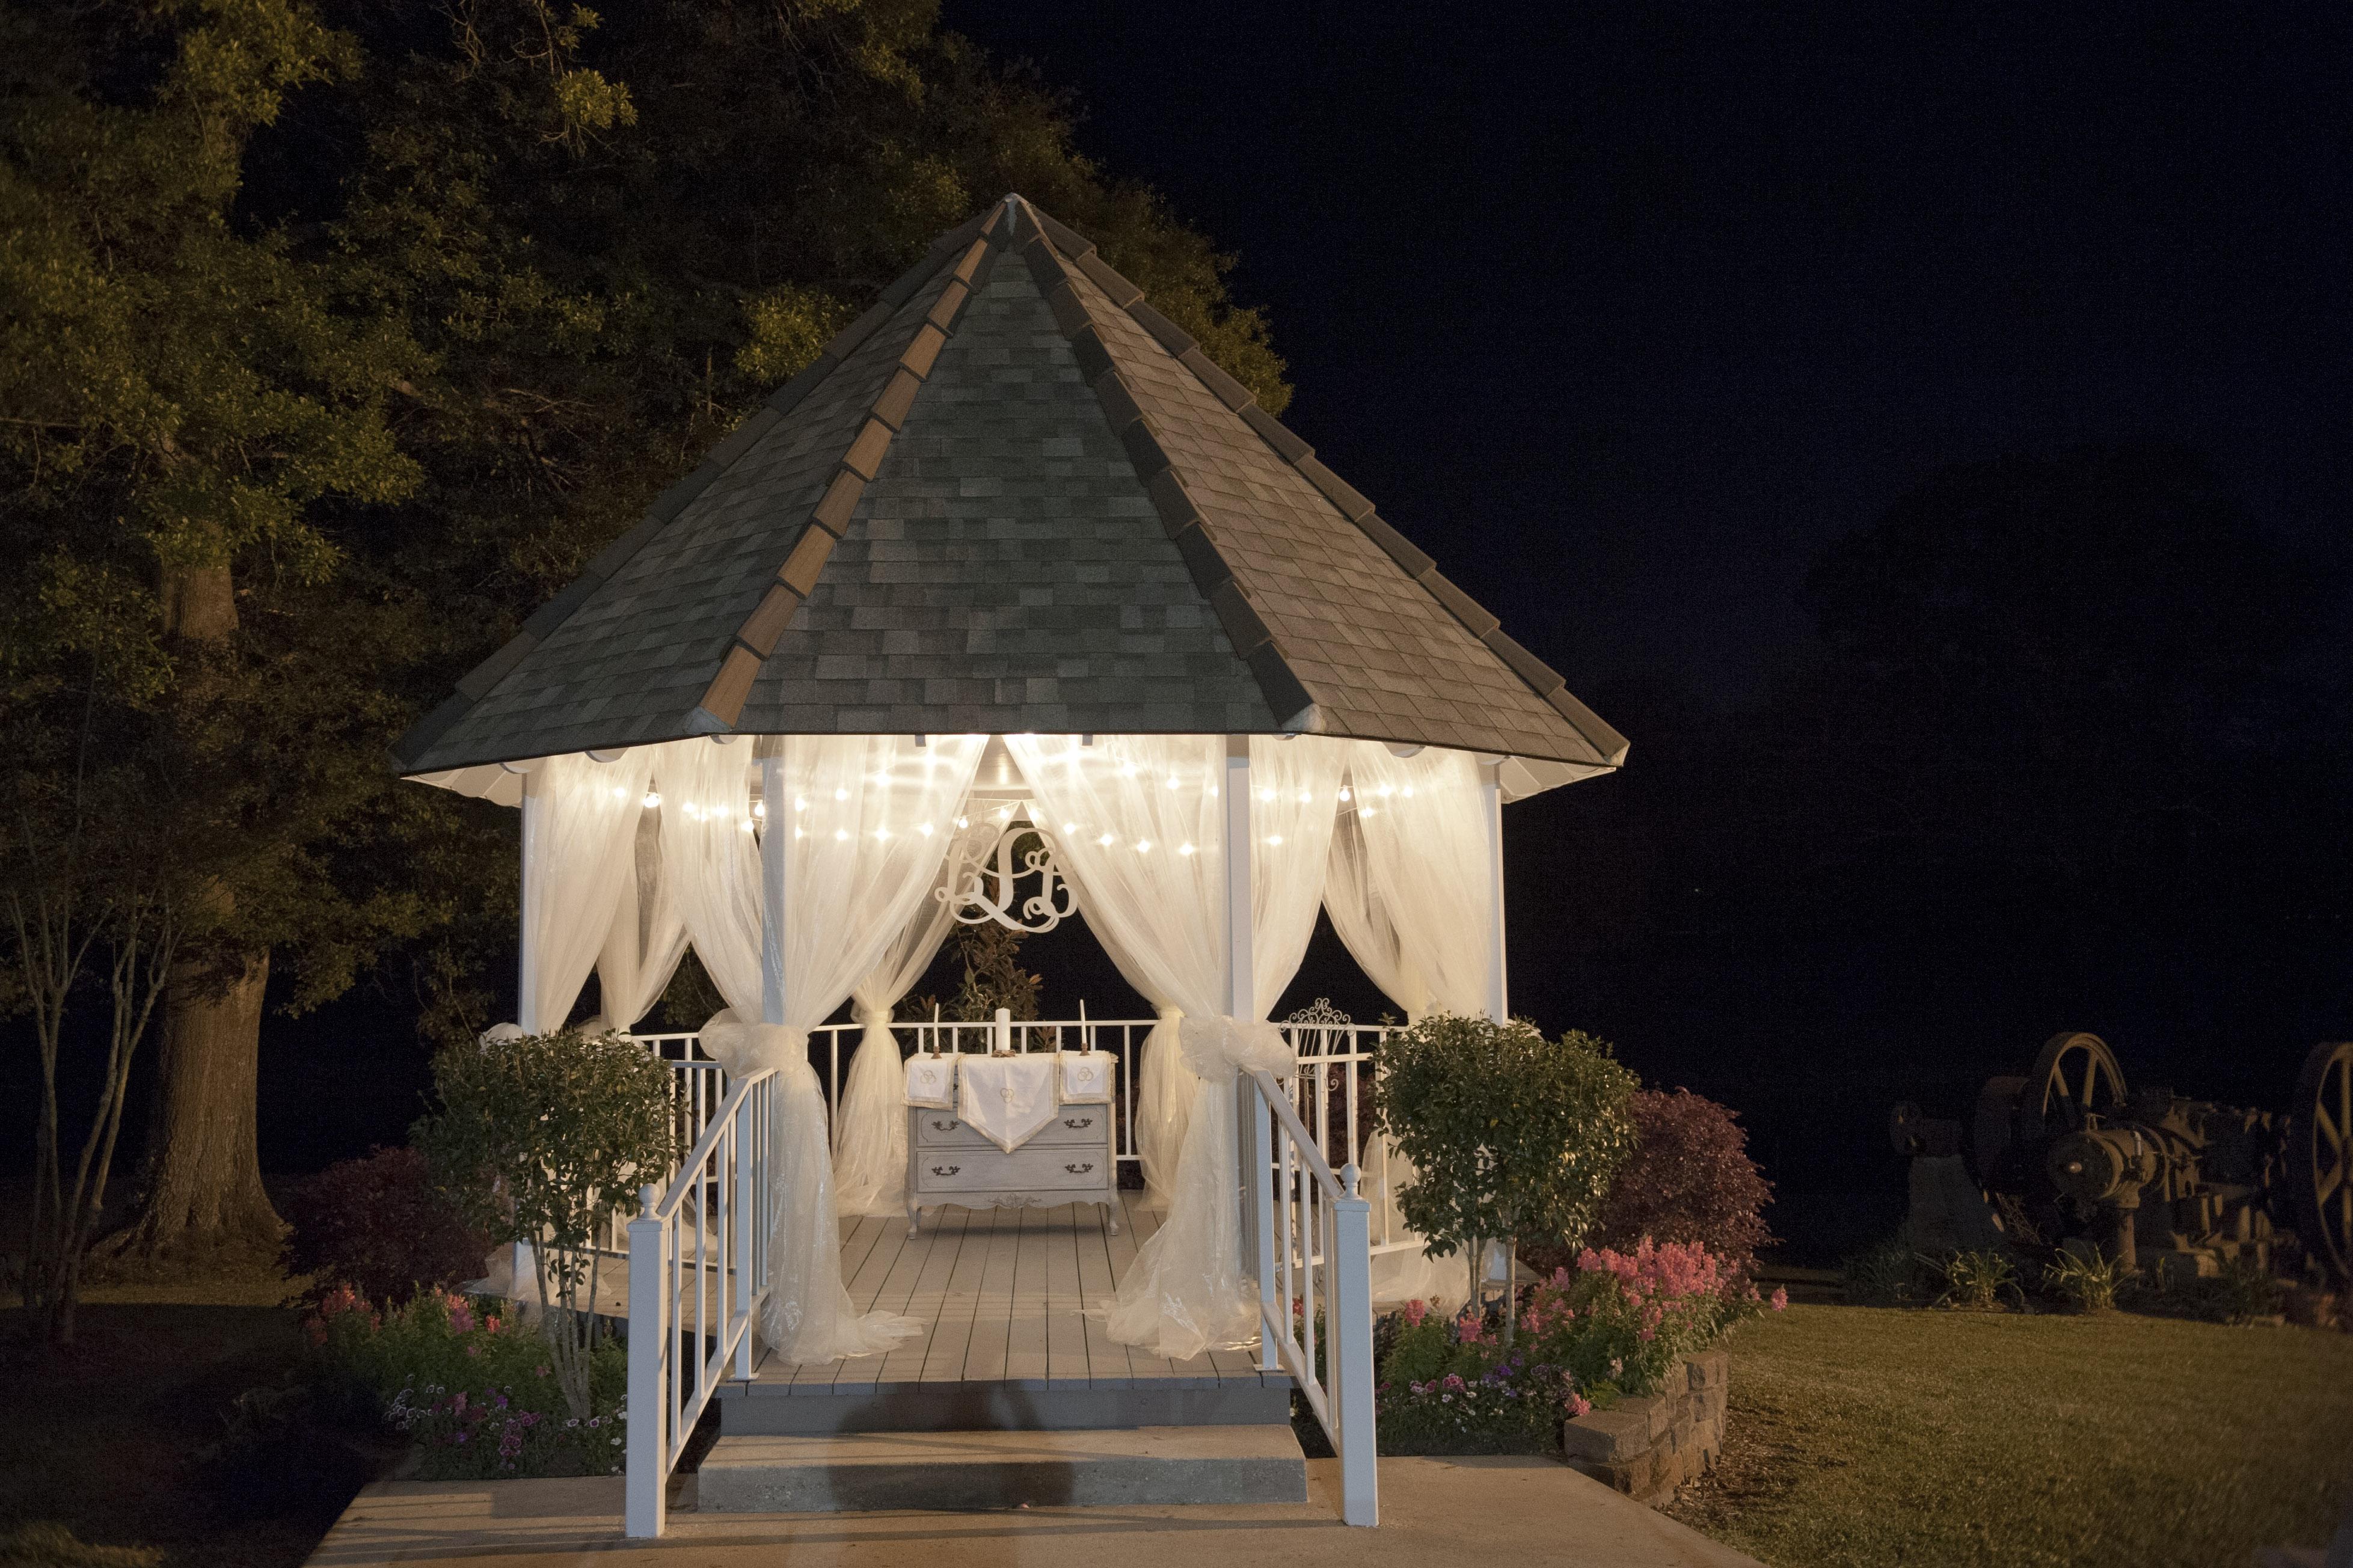 A white outdoor wedding gazebo decorated for a wedding at Poche Bridge Country Club in Breaux Bridge, Louisiana.